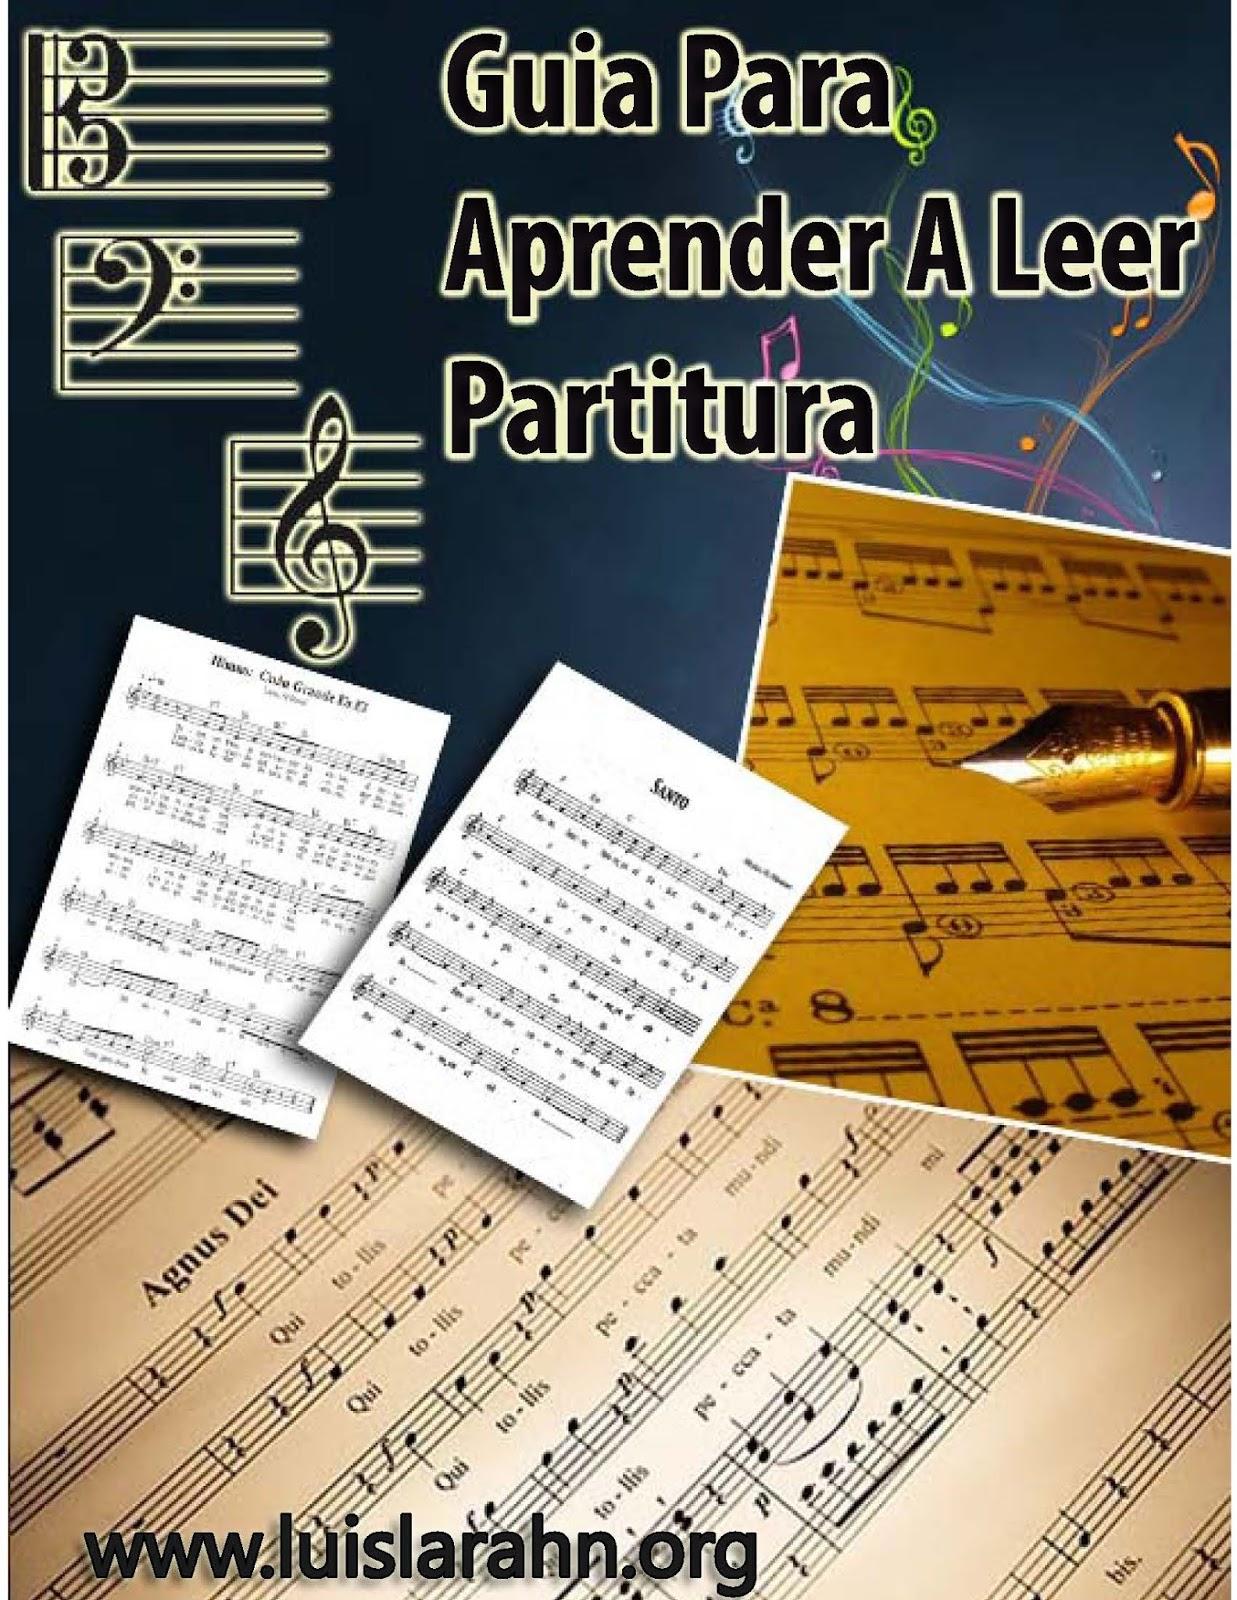 Guia Para Aprender A Leer Partitura  Luis Lara